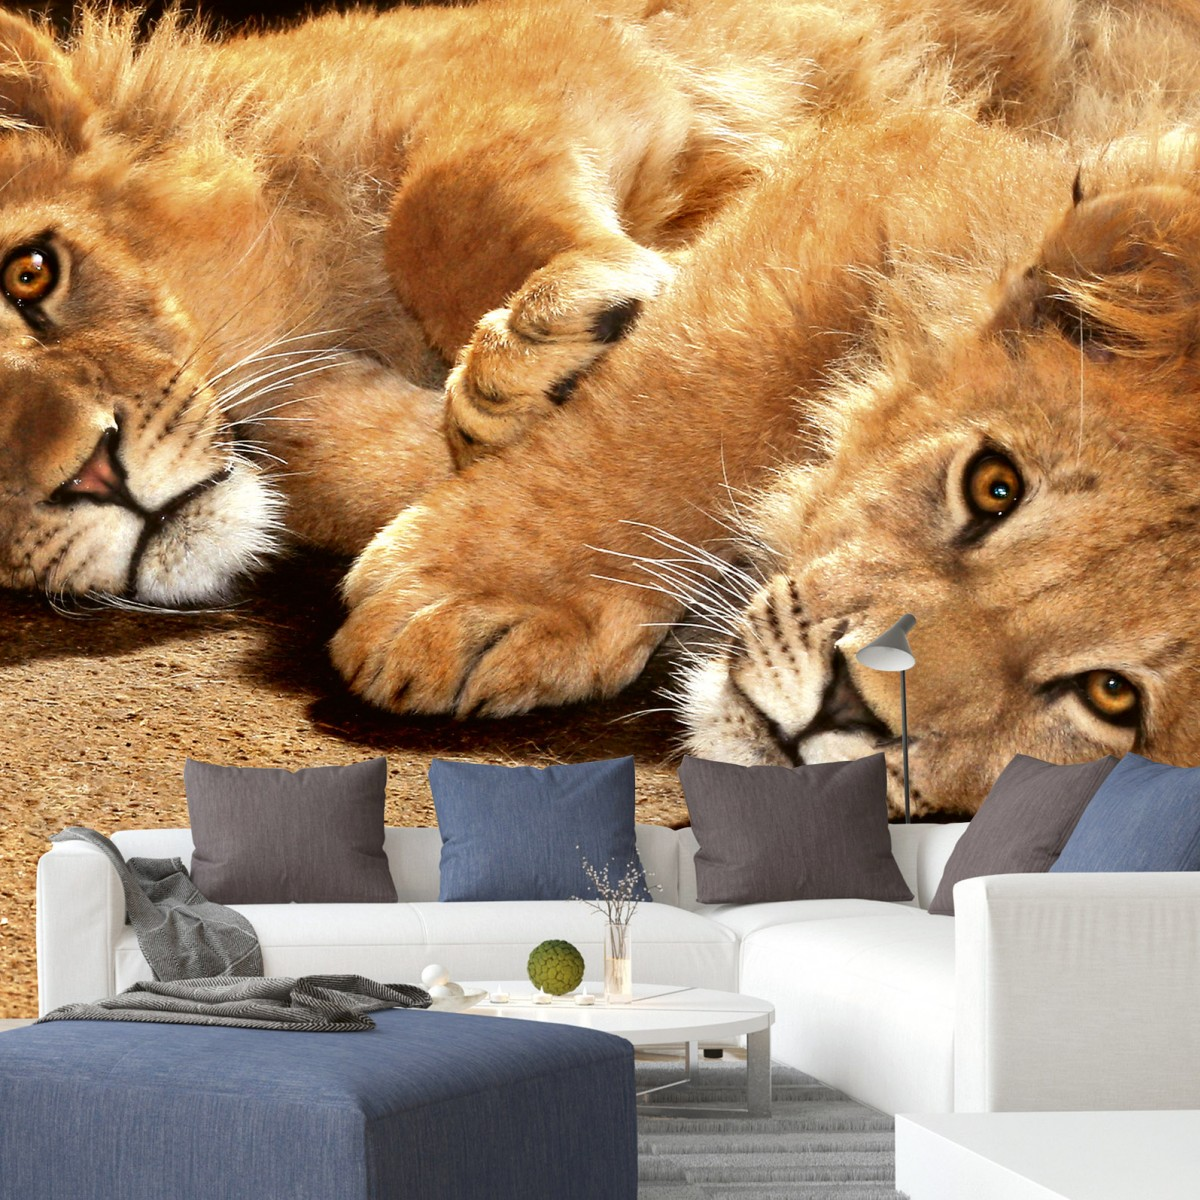 Foto tapet 3D Young Lions, Dimex, 5 fâșii, 375 x 250cm